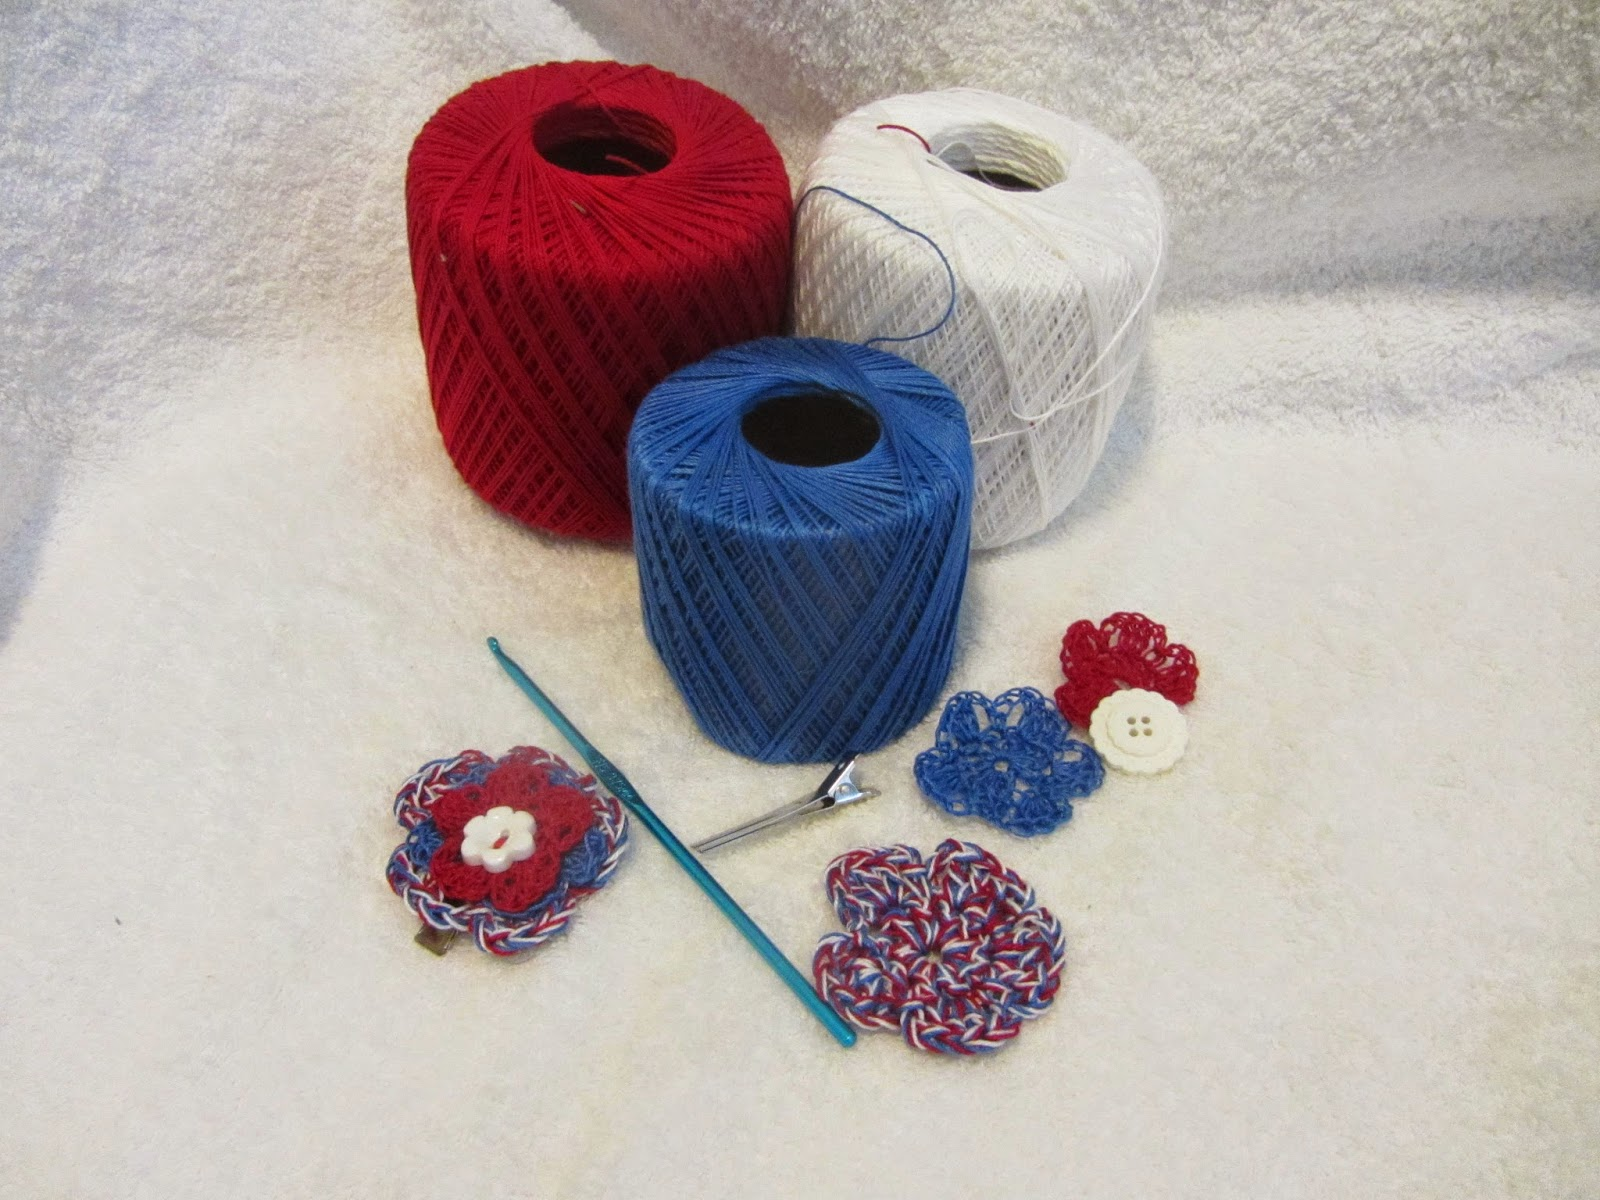 Crochet Flower Hair Clips Red White Blue Series Via Mashed Potatoes